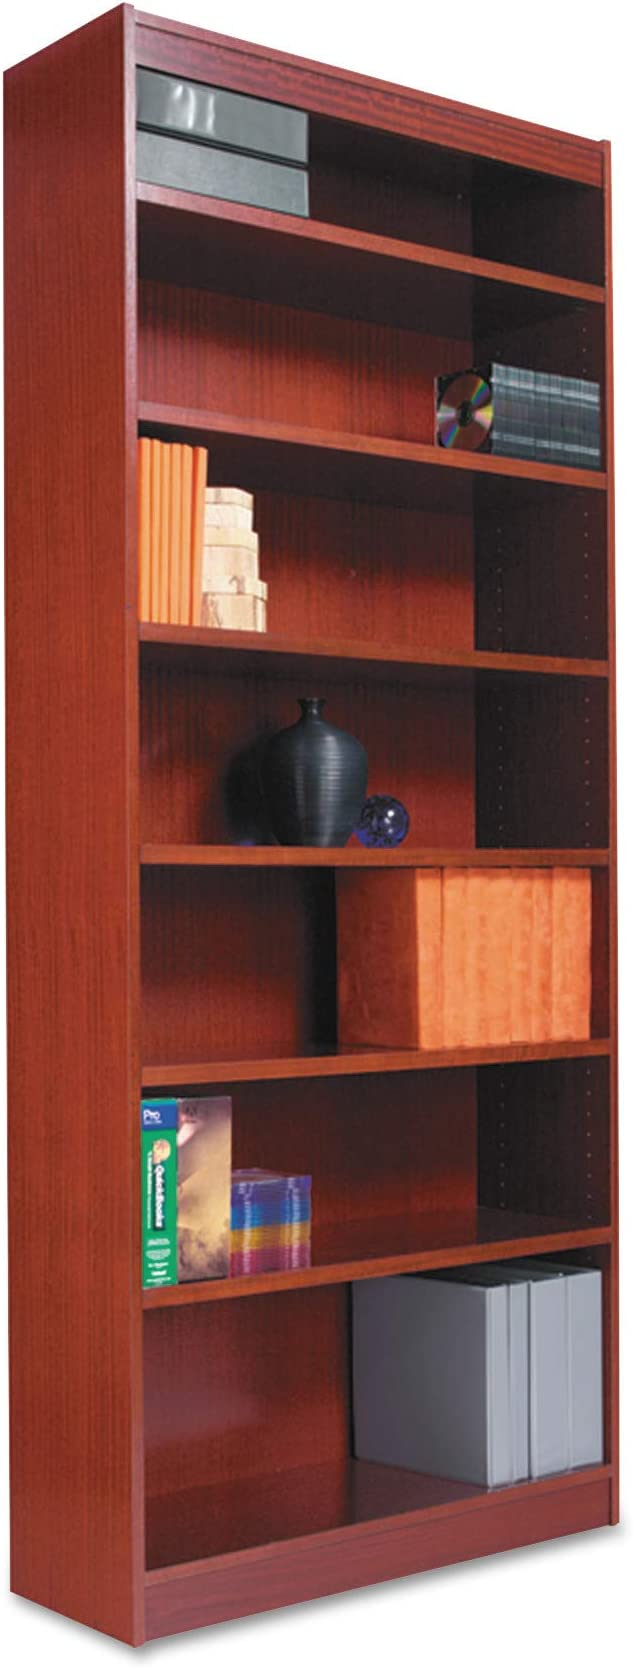 Alera Square Corner Wood Bookcase Six Shelf 35 5 8 X 11 3 4 X 72 Inch Medium Cherry Furniture Decor Amazon Com